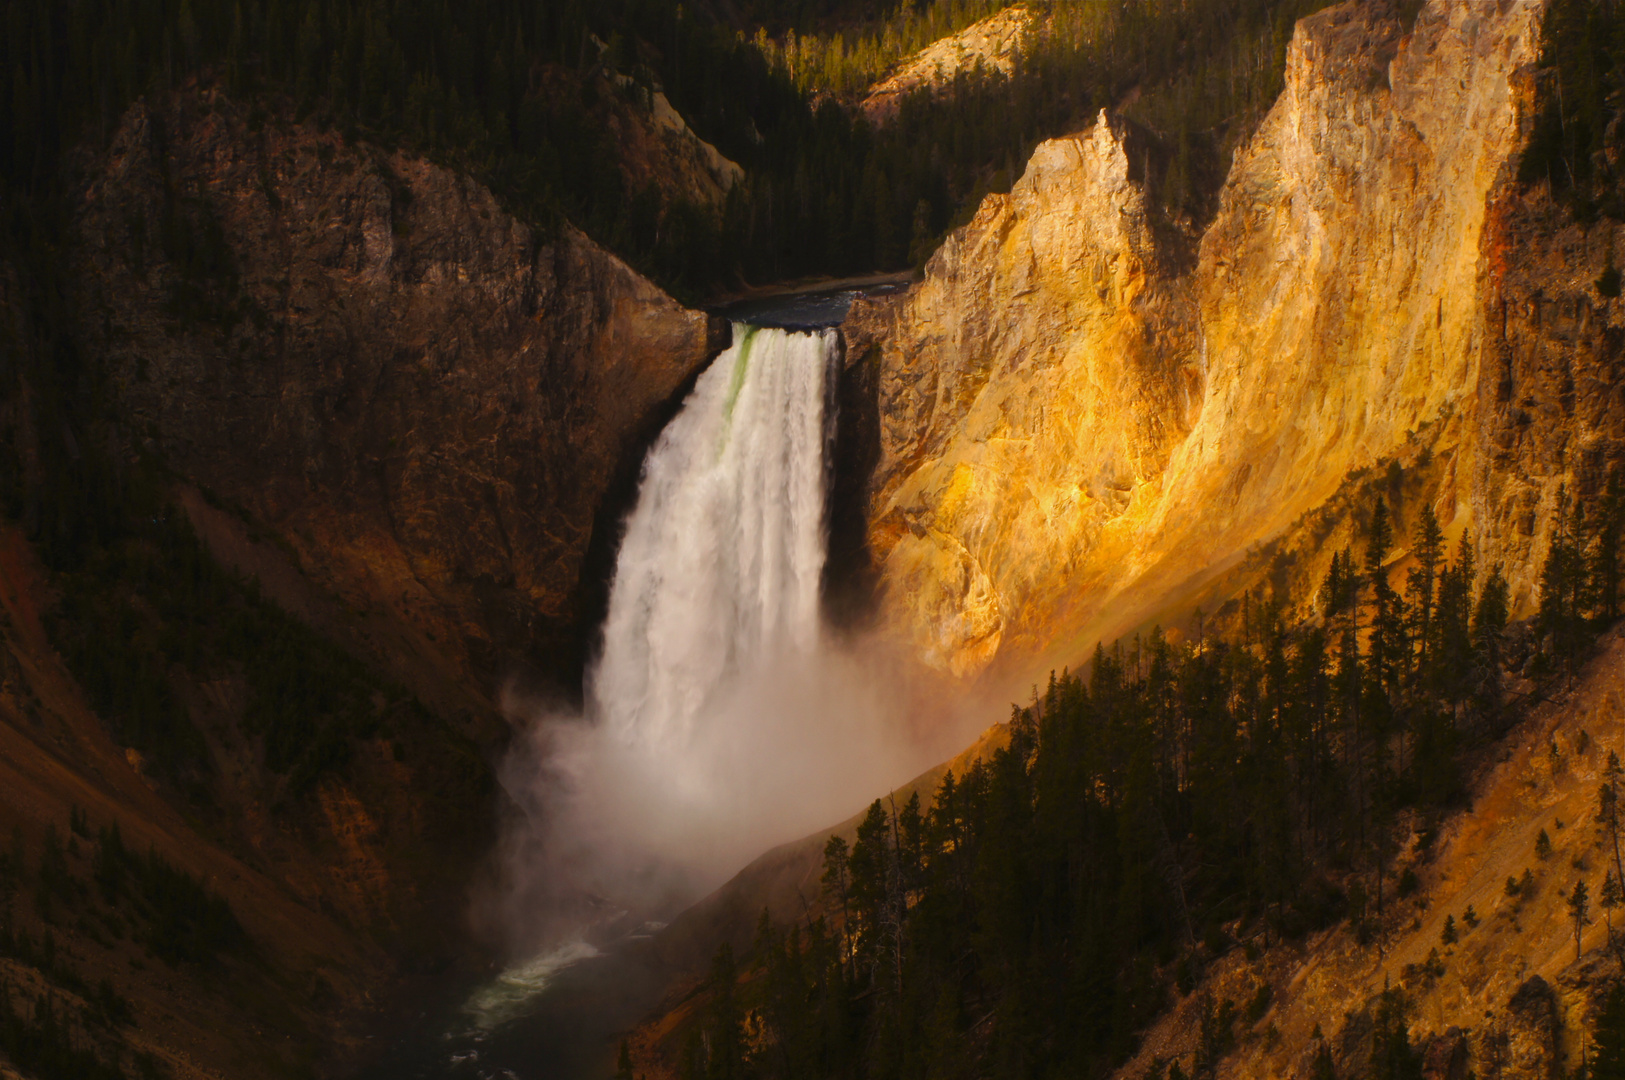 Lower fall Yellowstone river